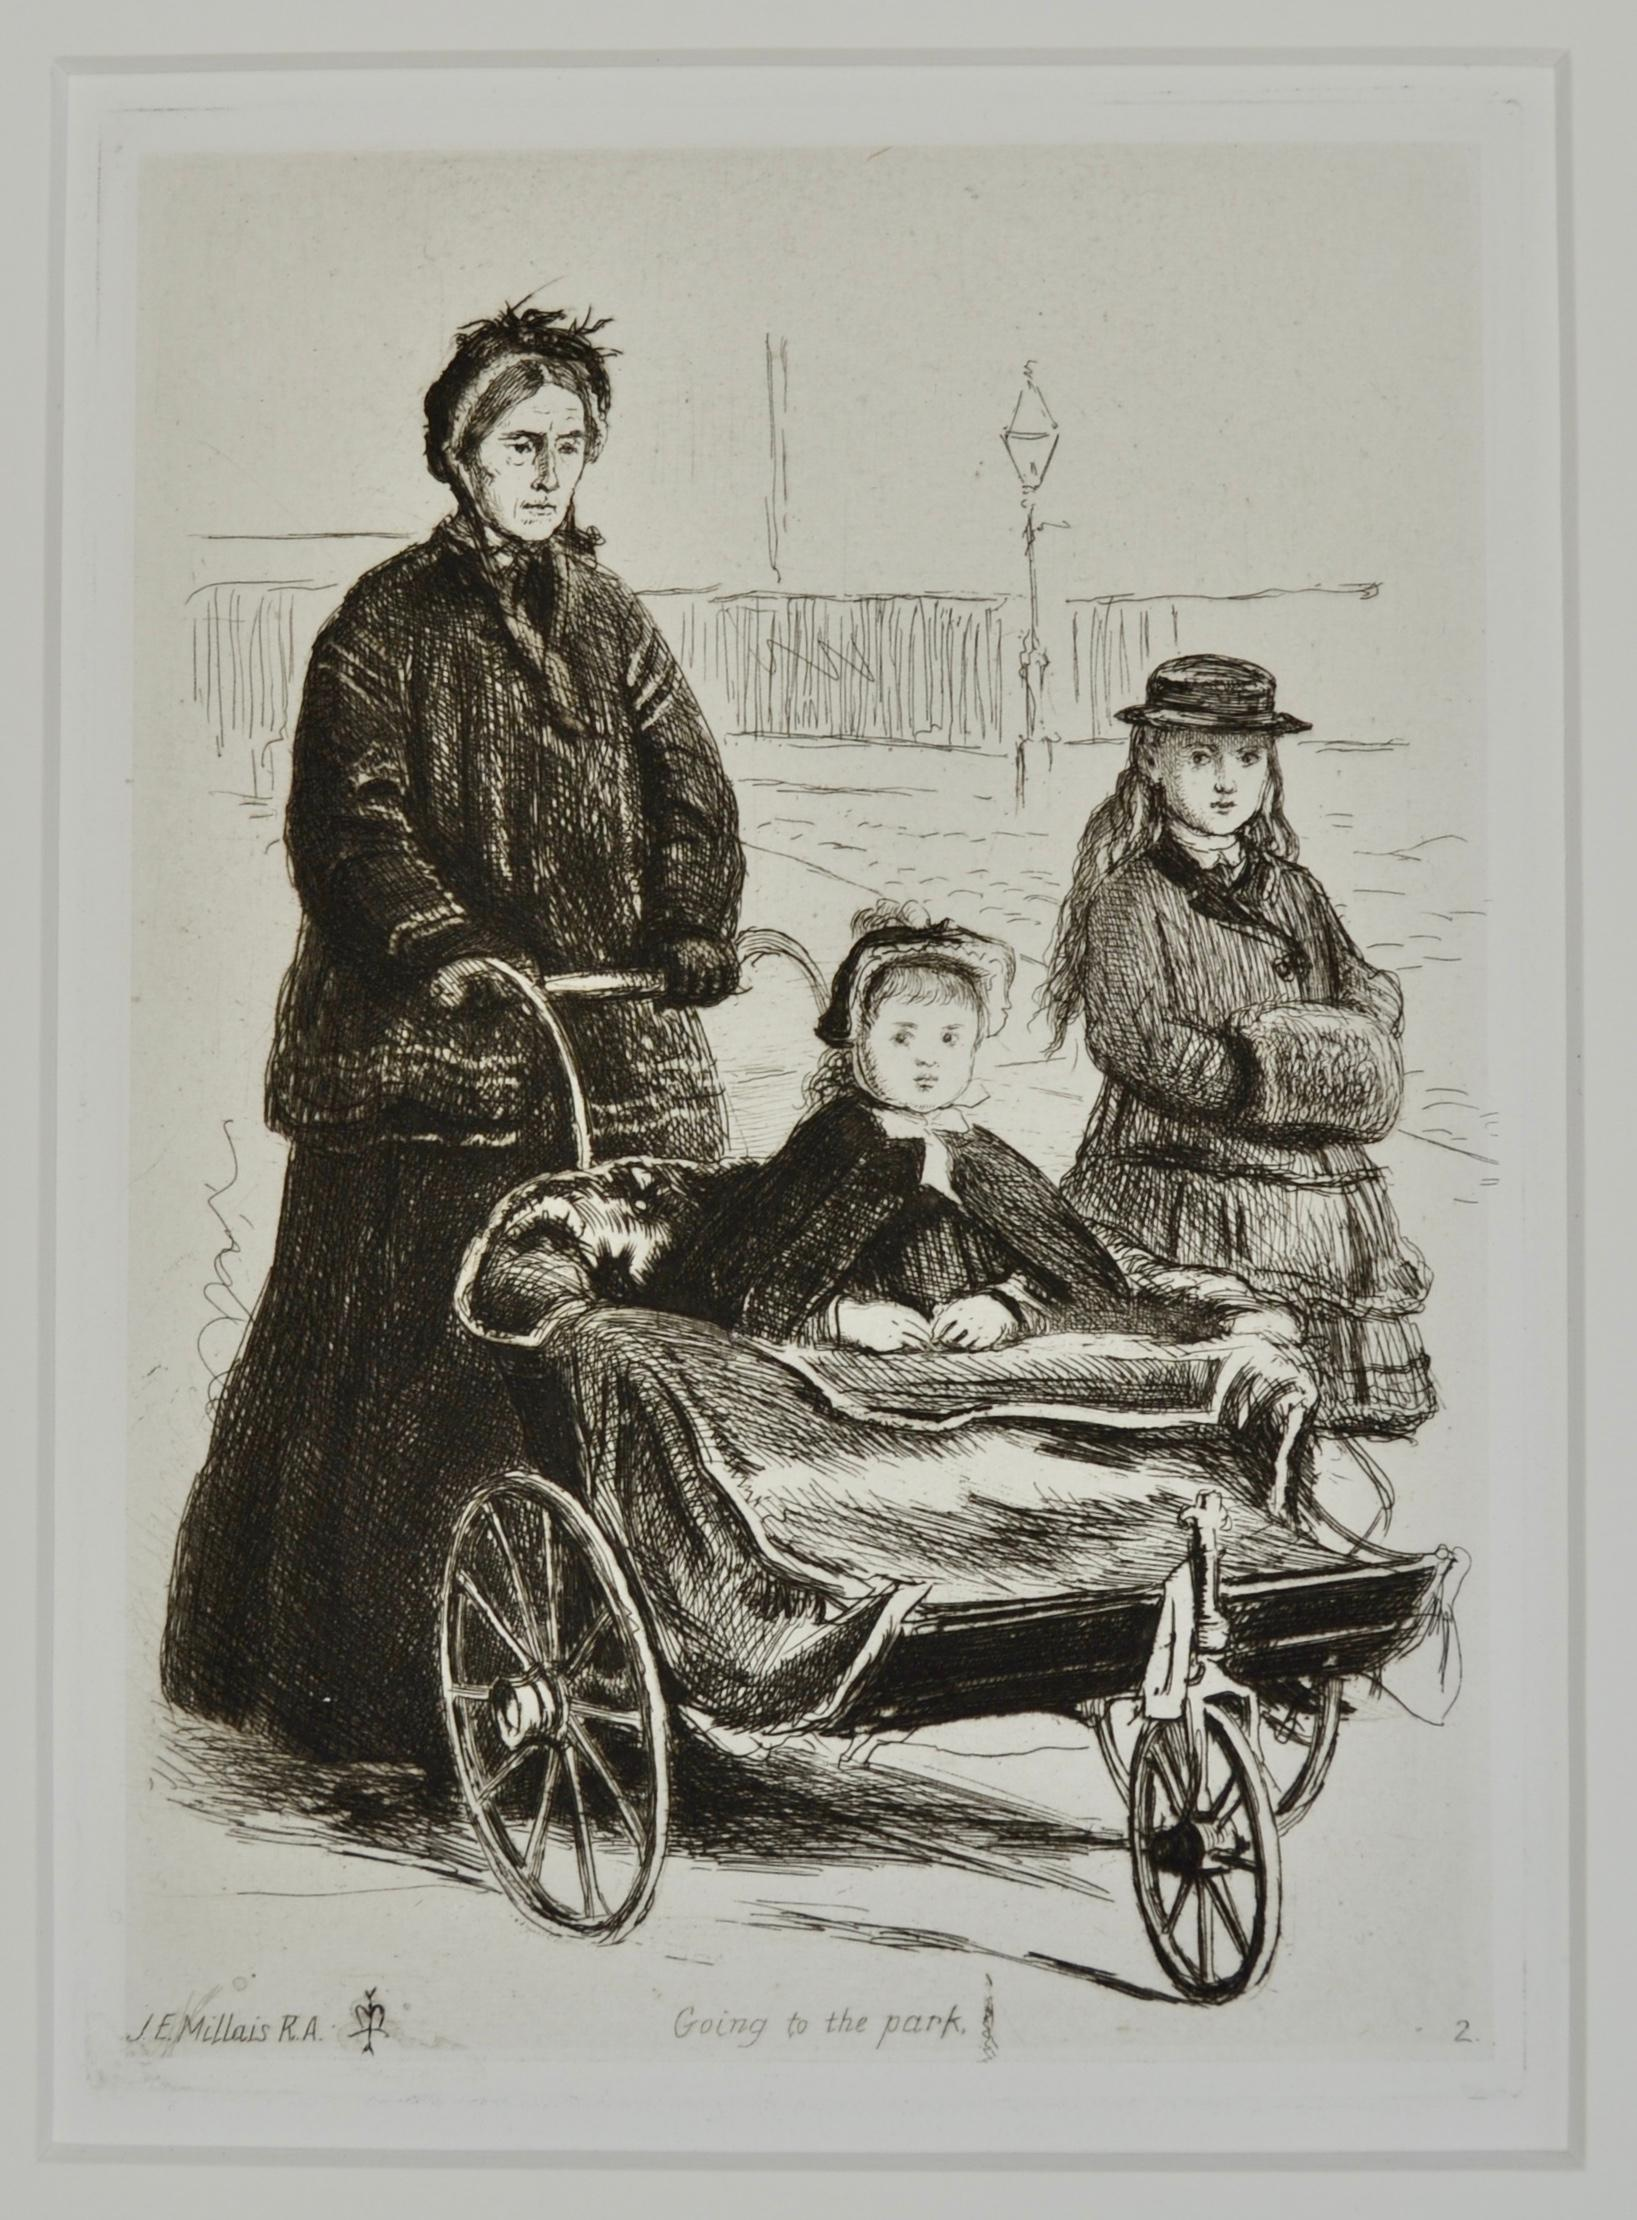 Going to the Park - Etching by Pre-Raphaelite artist Sir John Everett Maillais